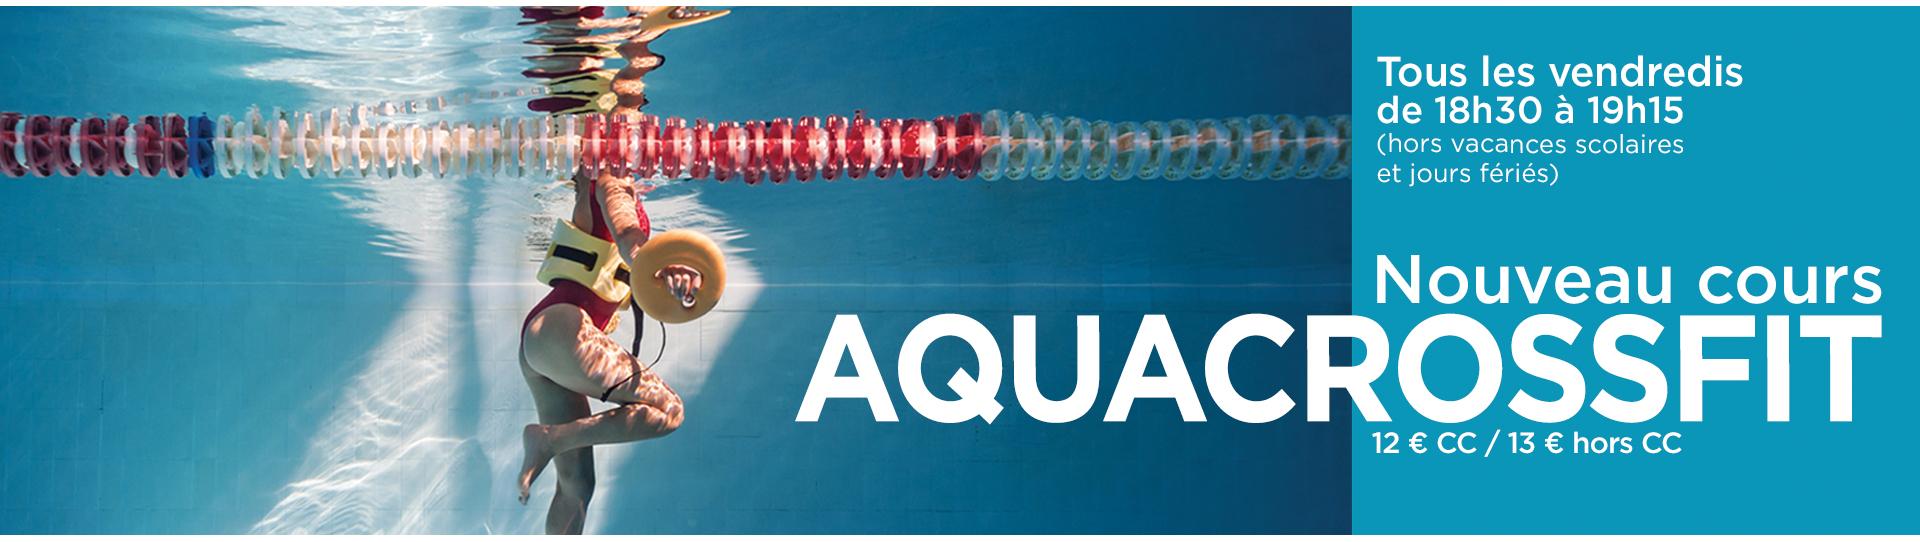 Aquacrossfit